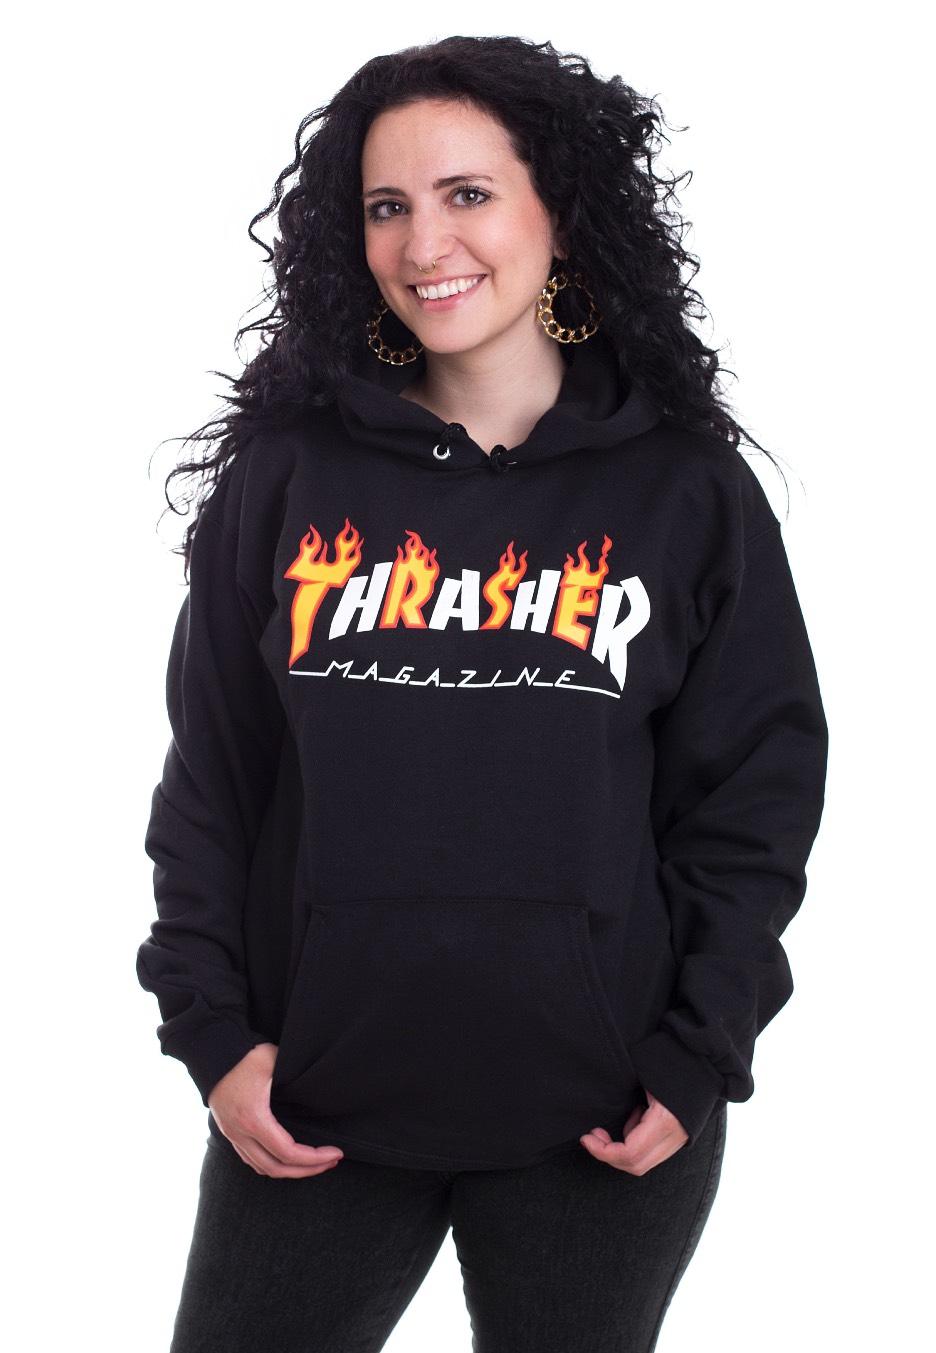 Thrasher - Thrasher Flame Mag Black - Hoodies